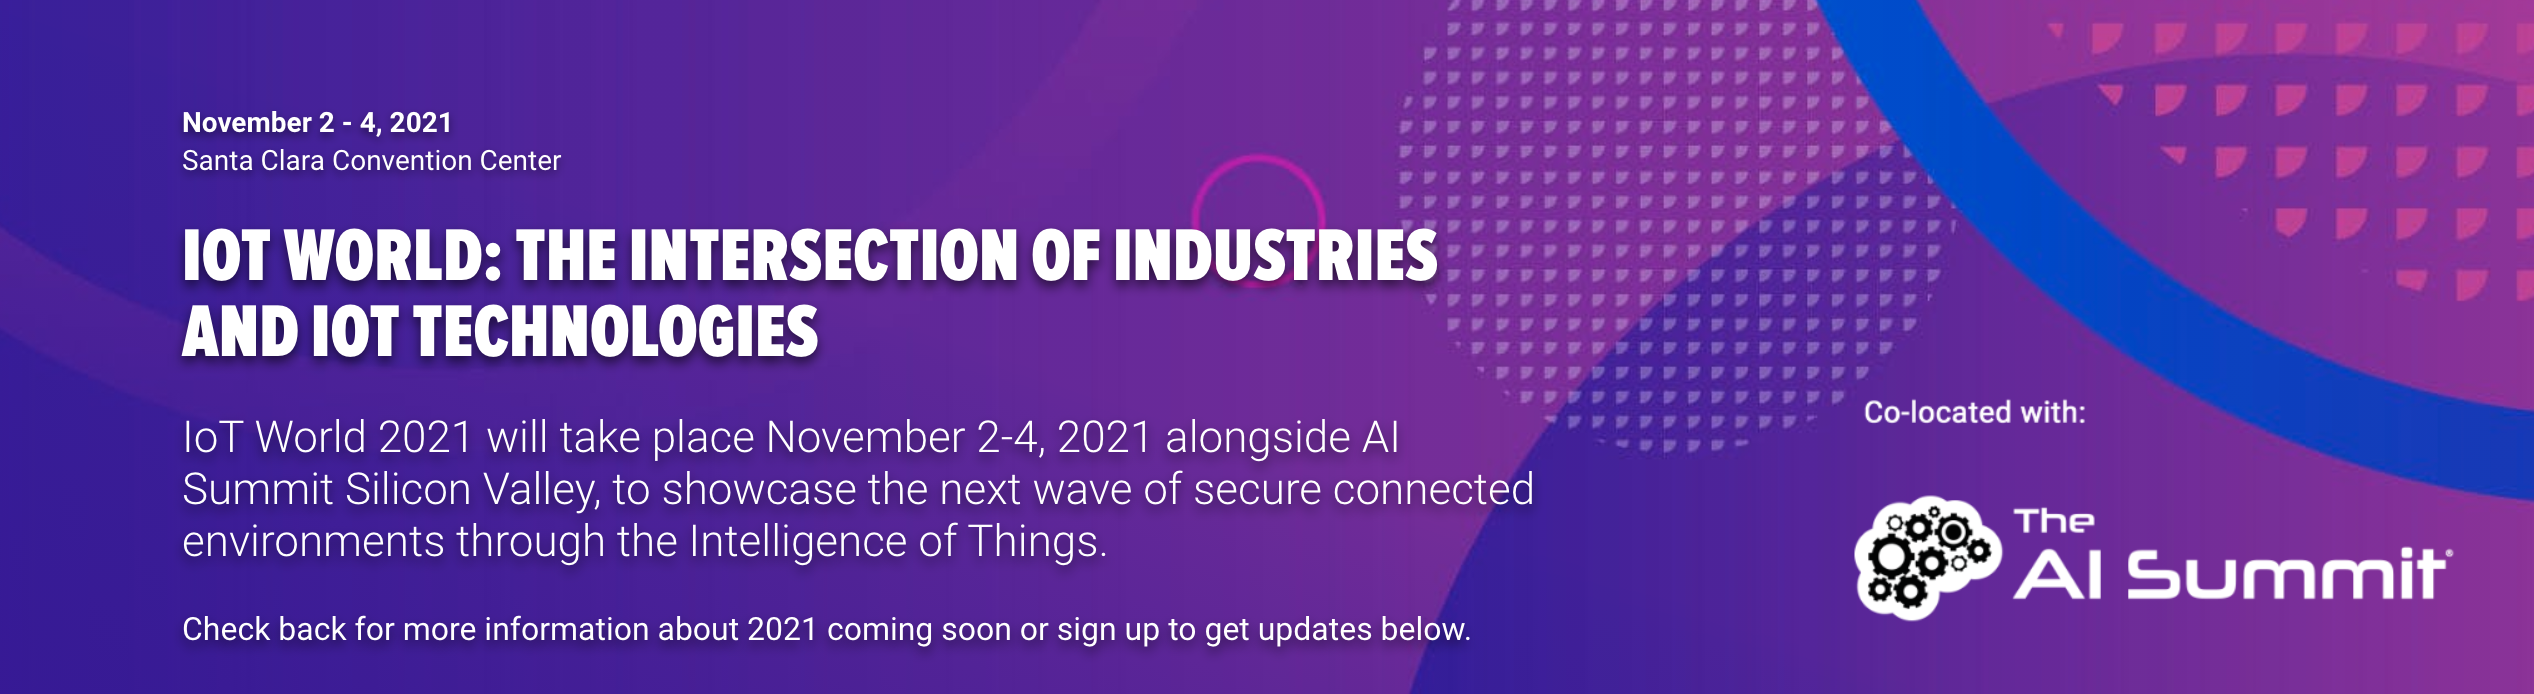 IoT World 2021